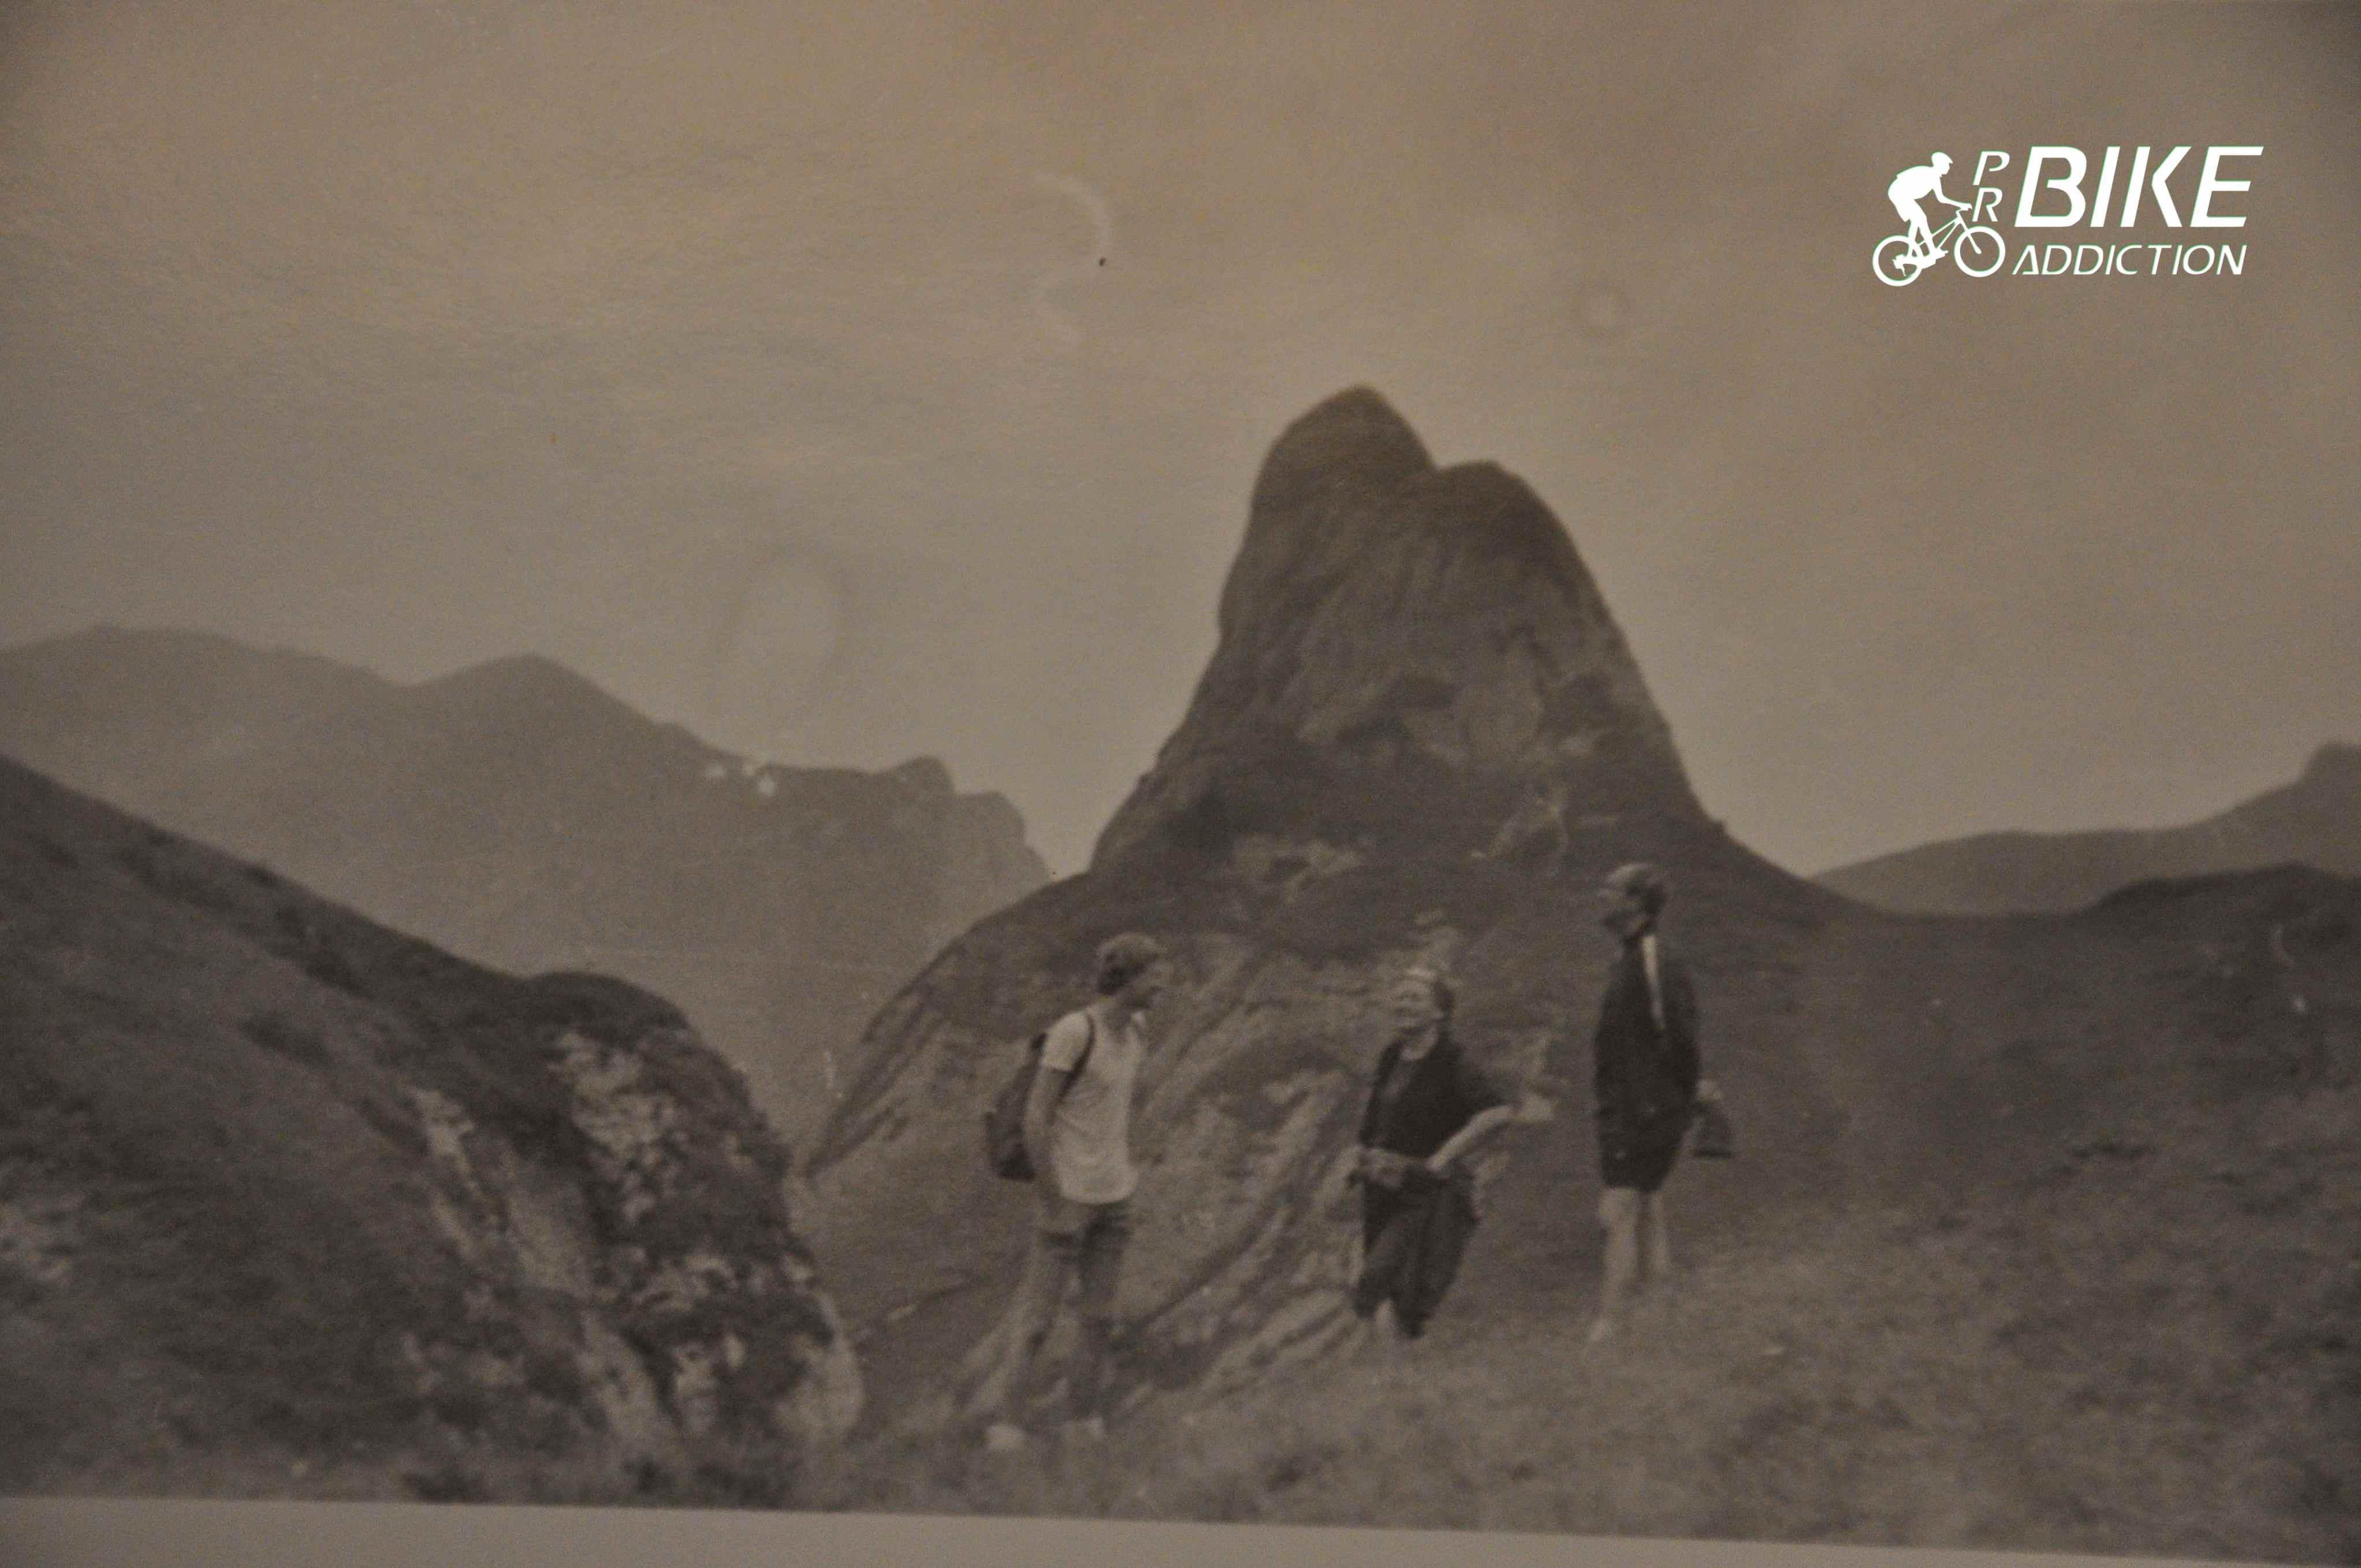 probikeaddiction ciucas anii 80 munte